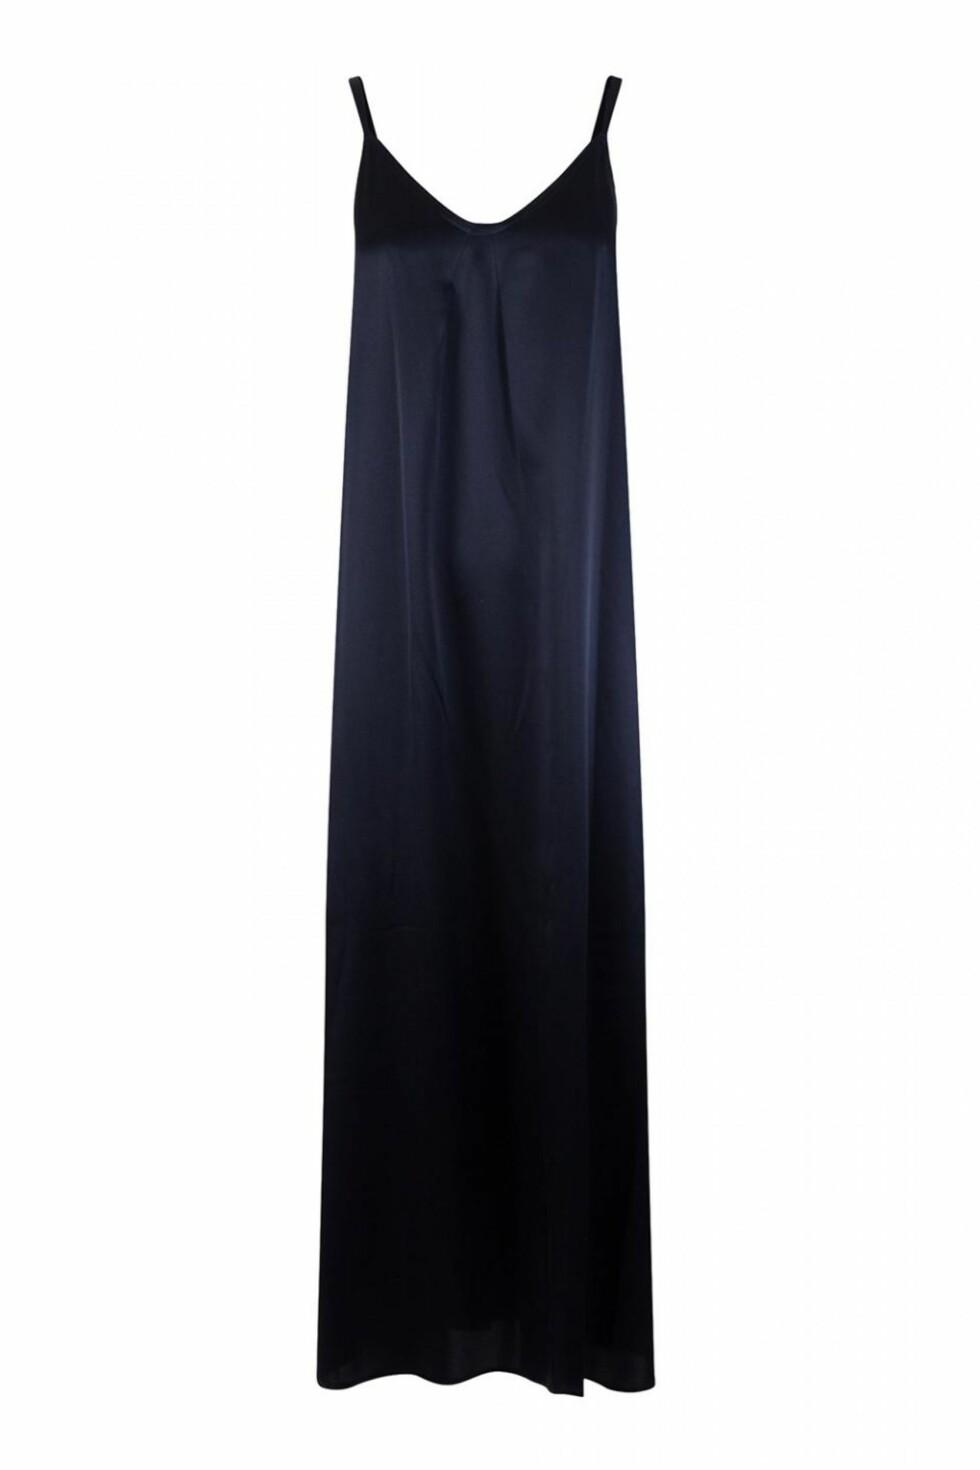 Slip-kjole fra Vince via Bogartstore.no | kr 3450 | https://track.adtraction.com/t/t?a=1127626678&as=1115634940&t=2&tk=1&url=https://bogartstore.no/shop/women/pleat-neck-slip-dress/